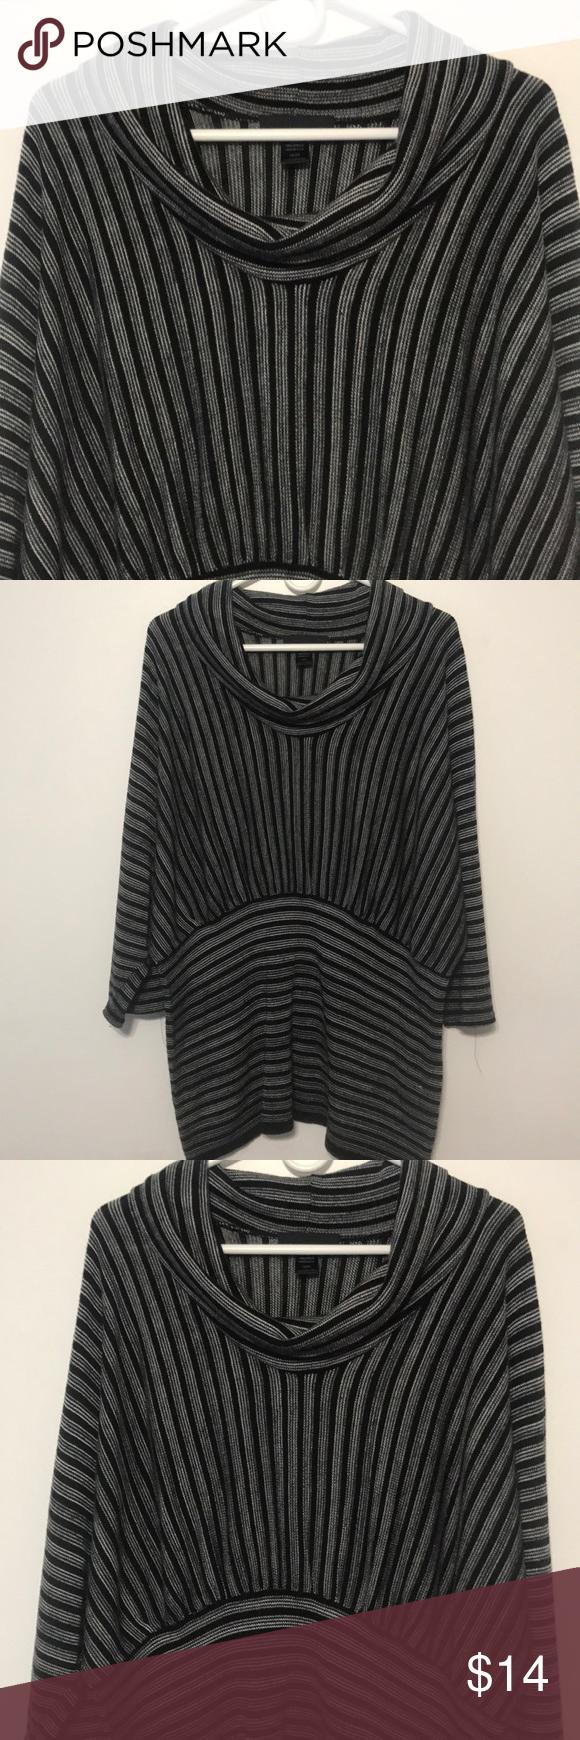 1a5dad430c 4th of July Sale 🇺🇸 Ashley Stewart 18 20 Light Weight Knit Top 100%  Acrylic Ashley Stewart Tops Tunics